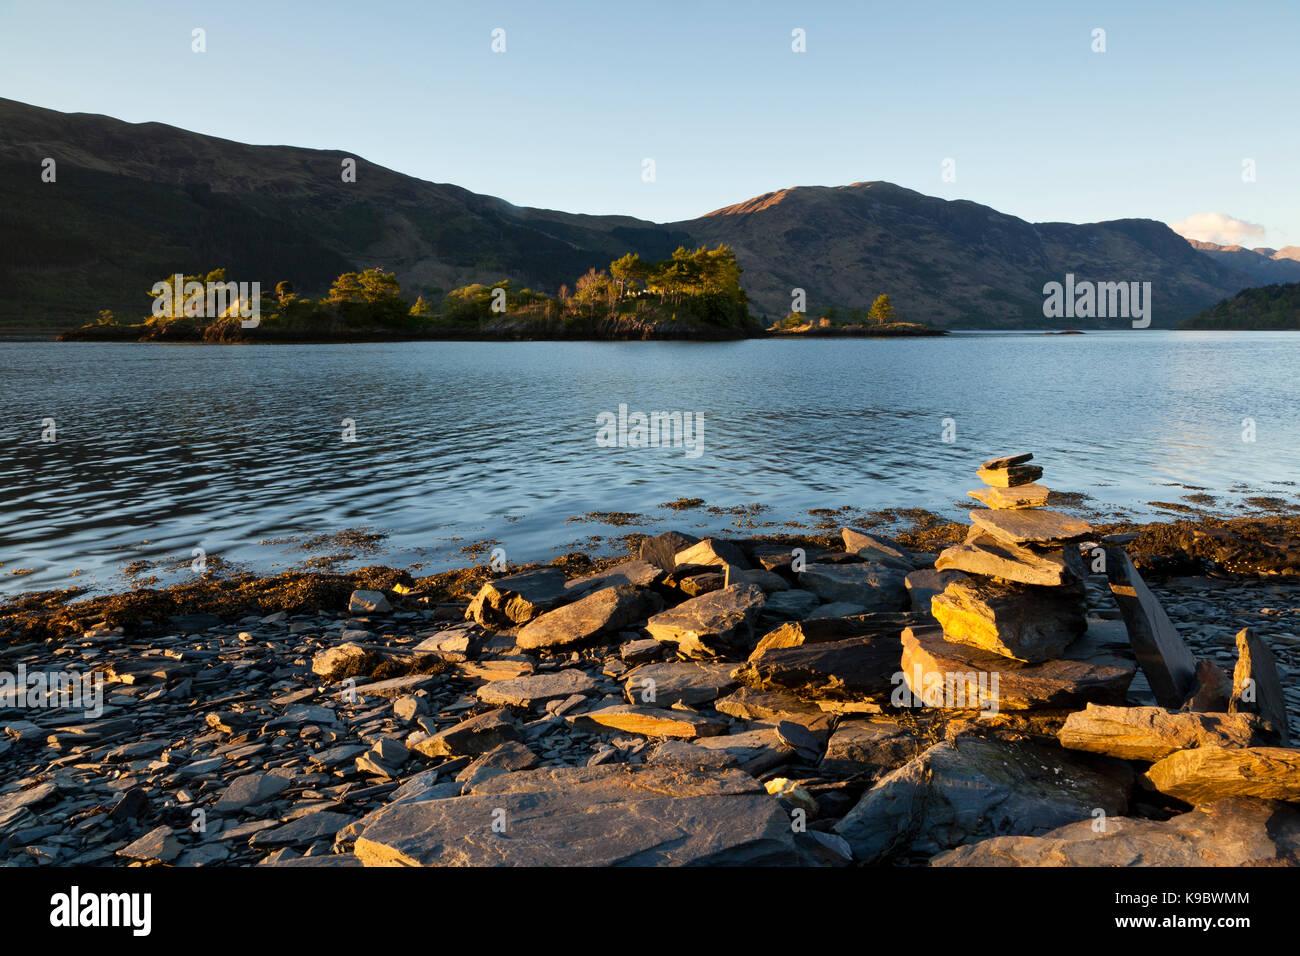 Eilean Munde buriel Island, Loch Leven, Ballachulish, Glencoe, Scotland, UK - Stock Image